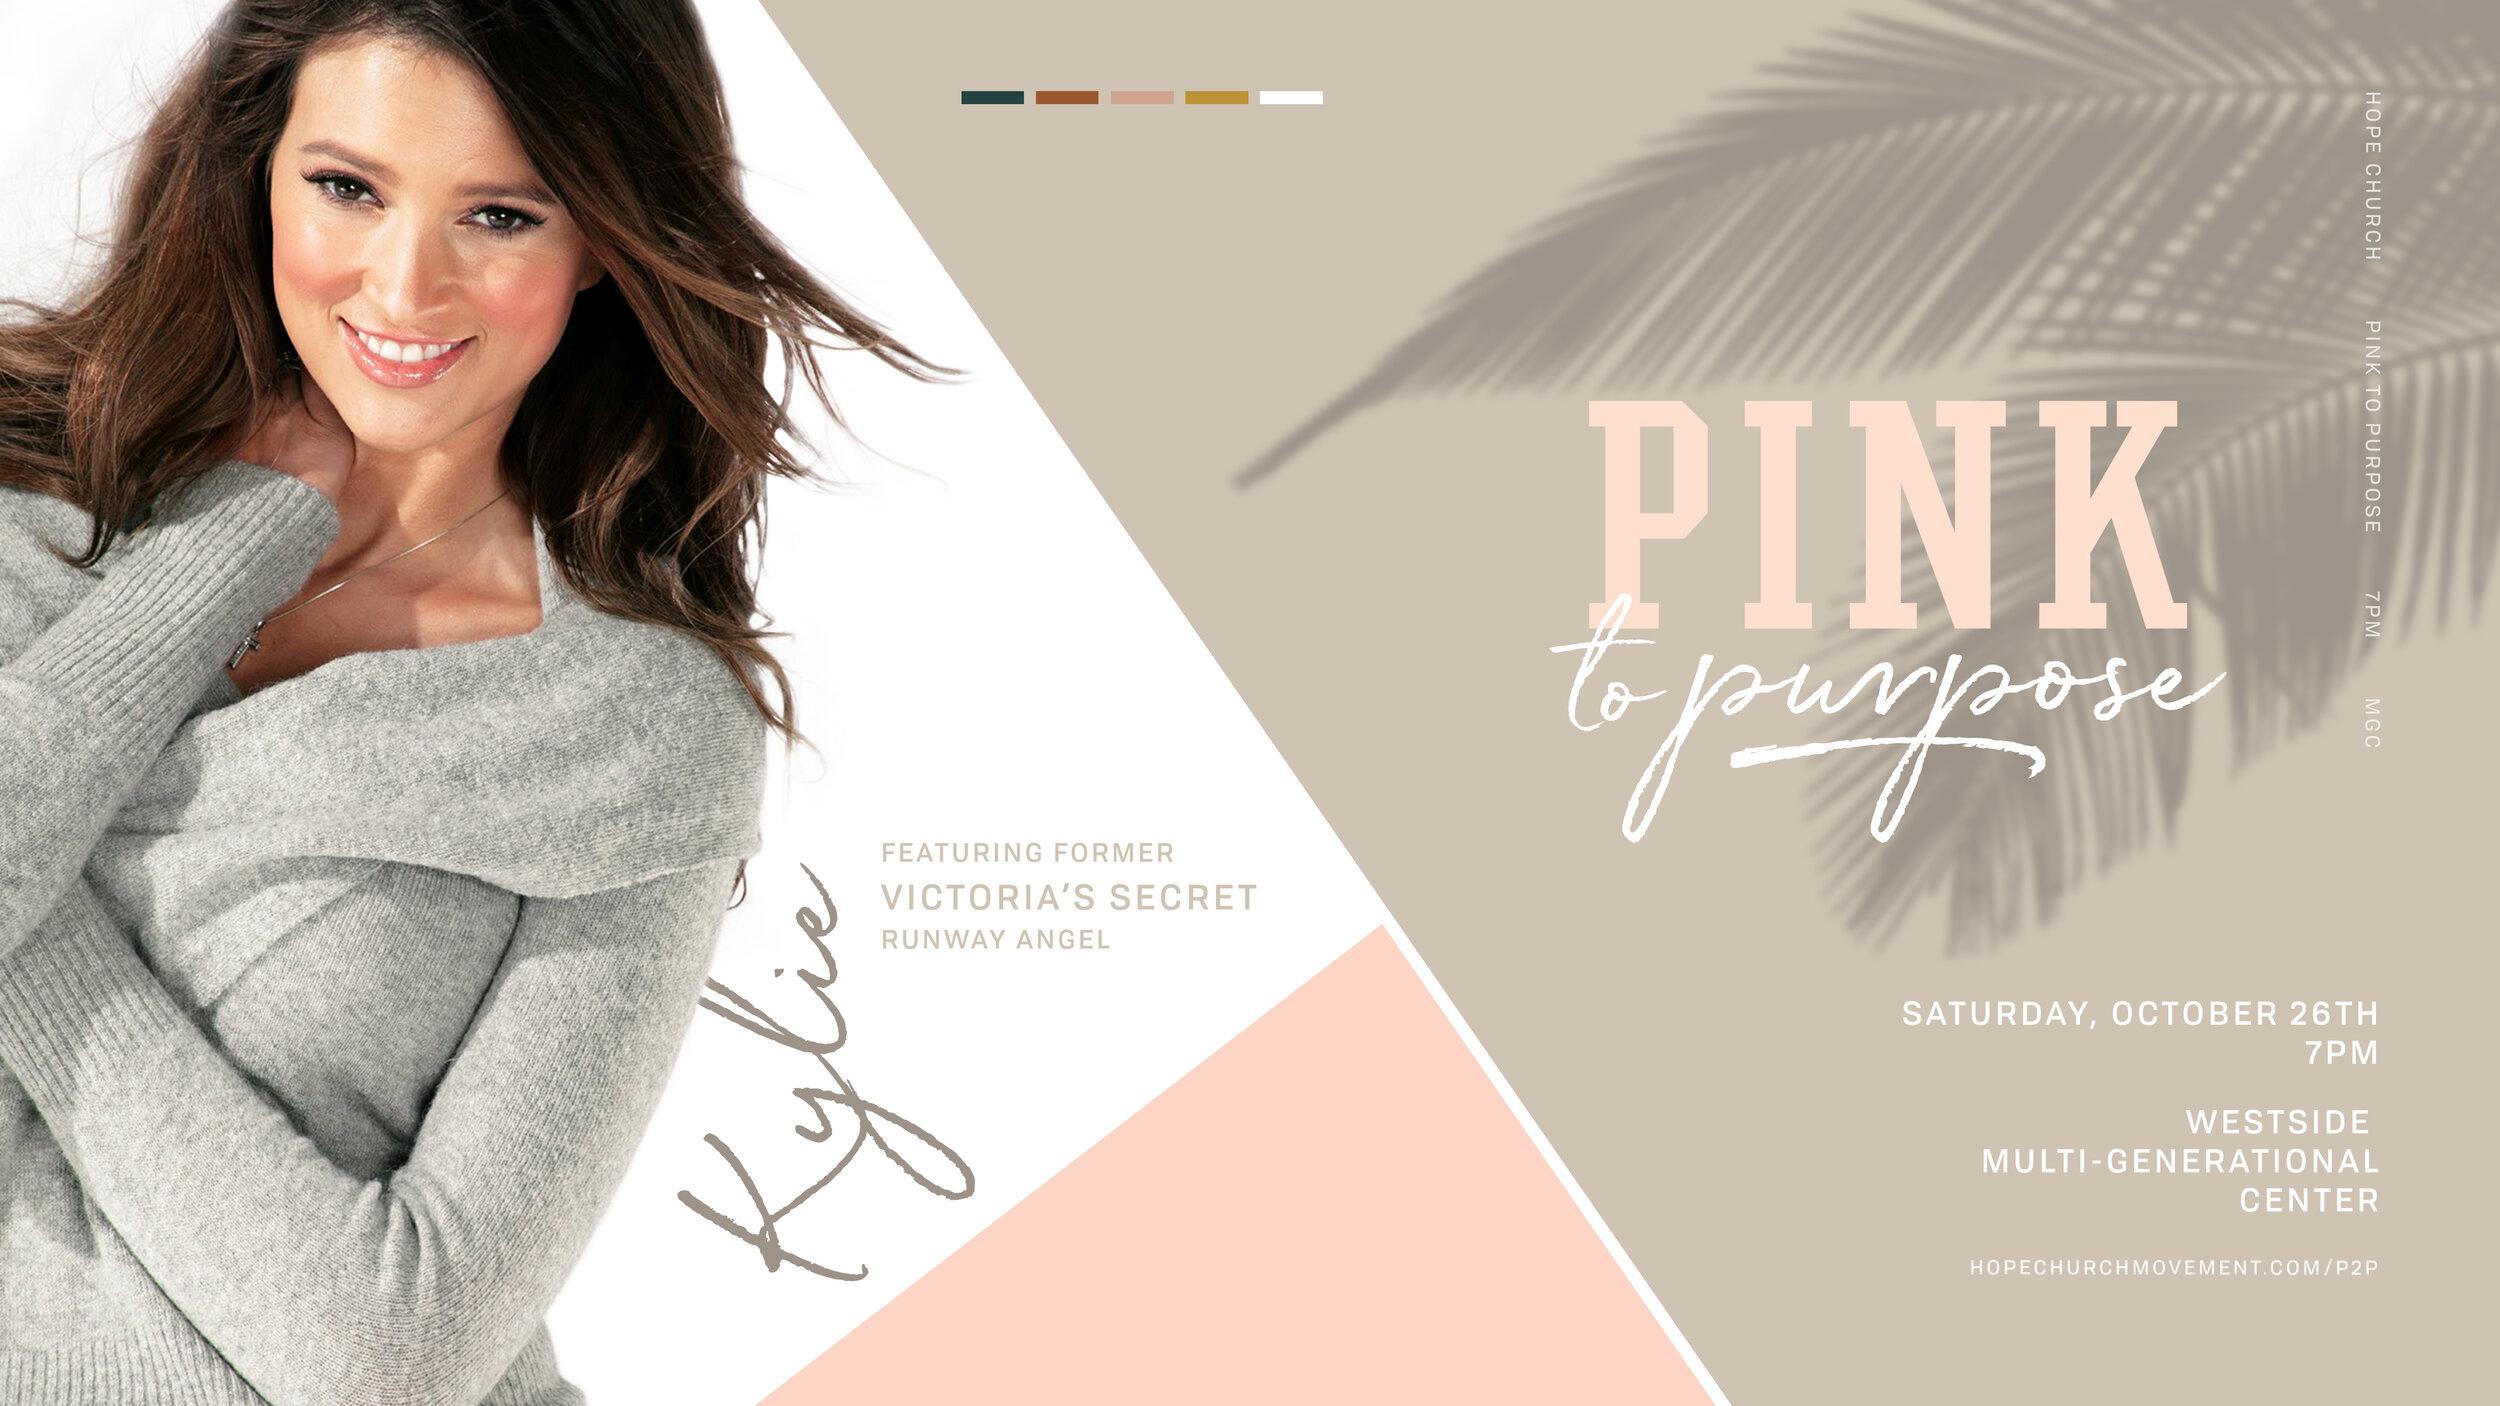 Pink to Purpose2019_CoreDesignArtboard 1 copy 6.jpg